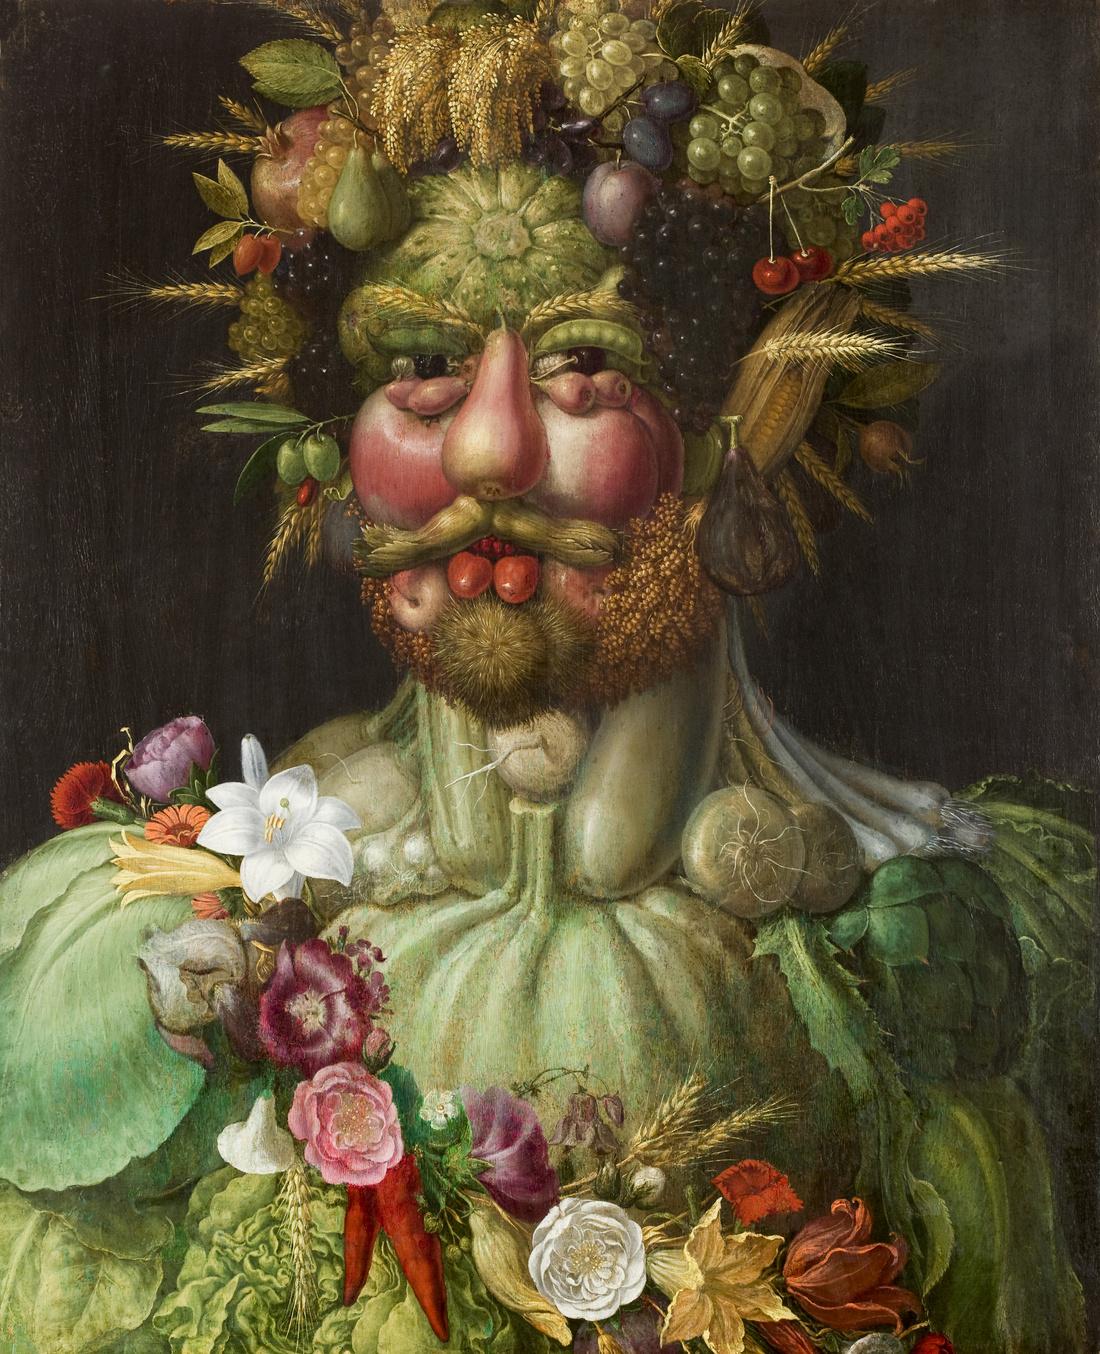 Giuseppe Arcimboldo, Vertumnus, 1589. Image via Wikimedia Commons.